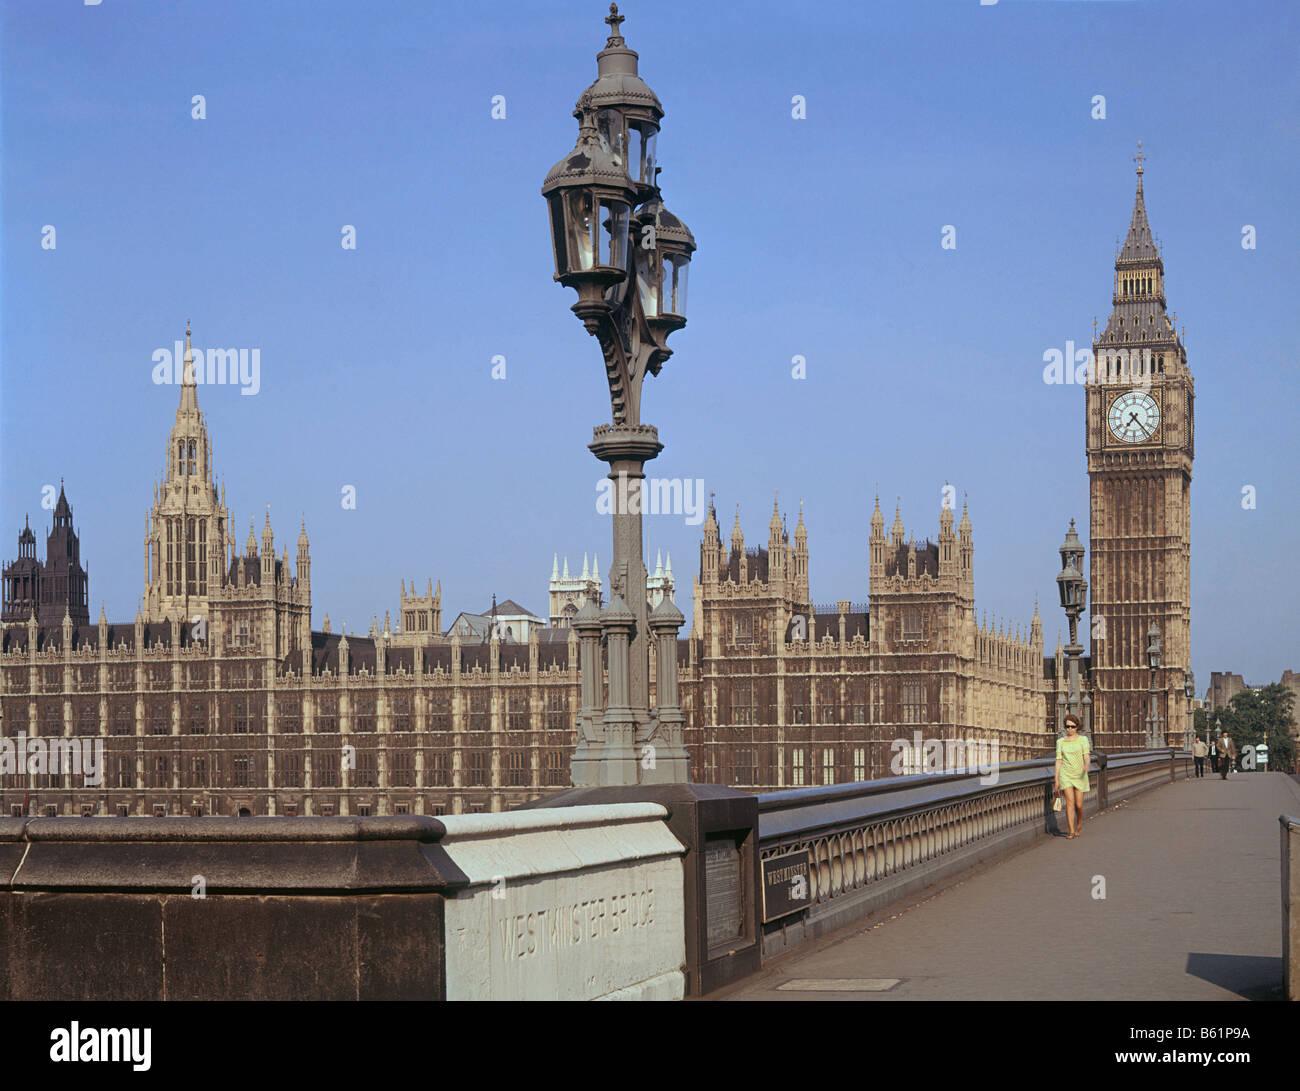 London,Westminster Bridge,Big Ben and theHouses of Parlament. Bridge designed byThomasPage,Palace ofWestminster - Stock Image